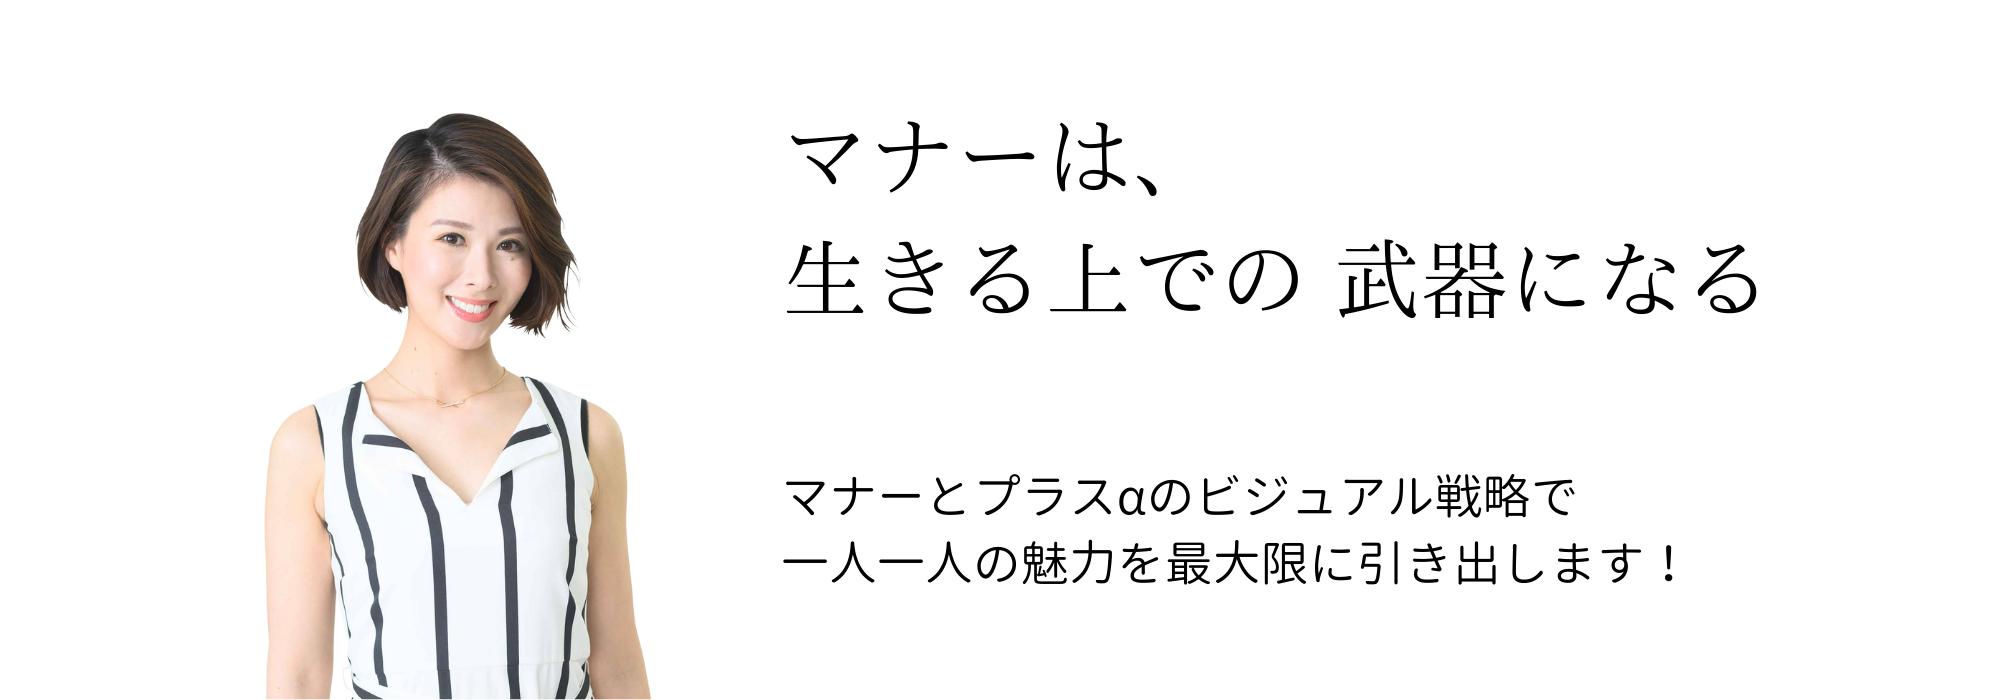 【office muse】島根県松江市のイメージコンサルタント&マナー講師